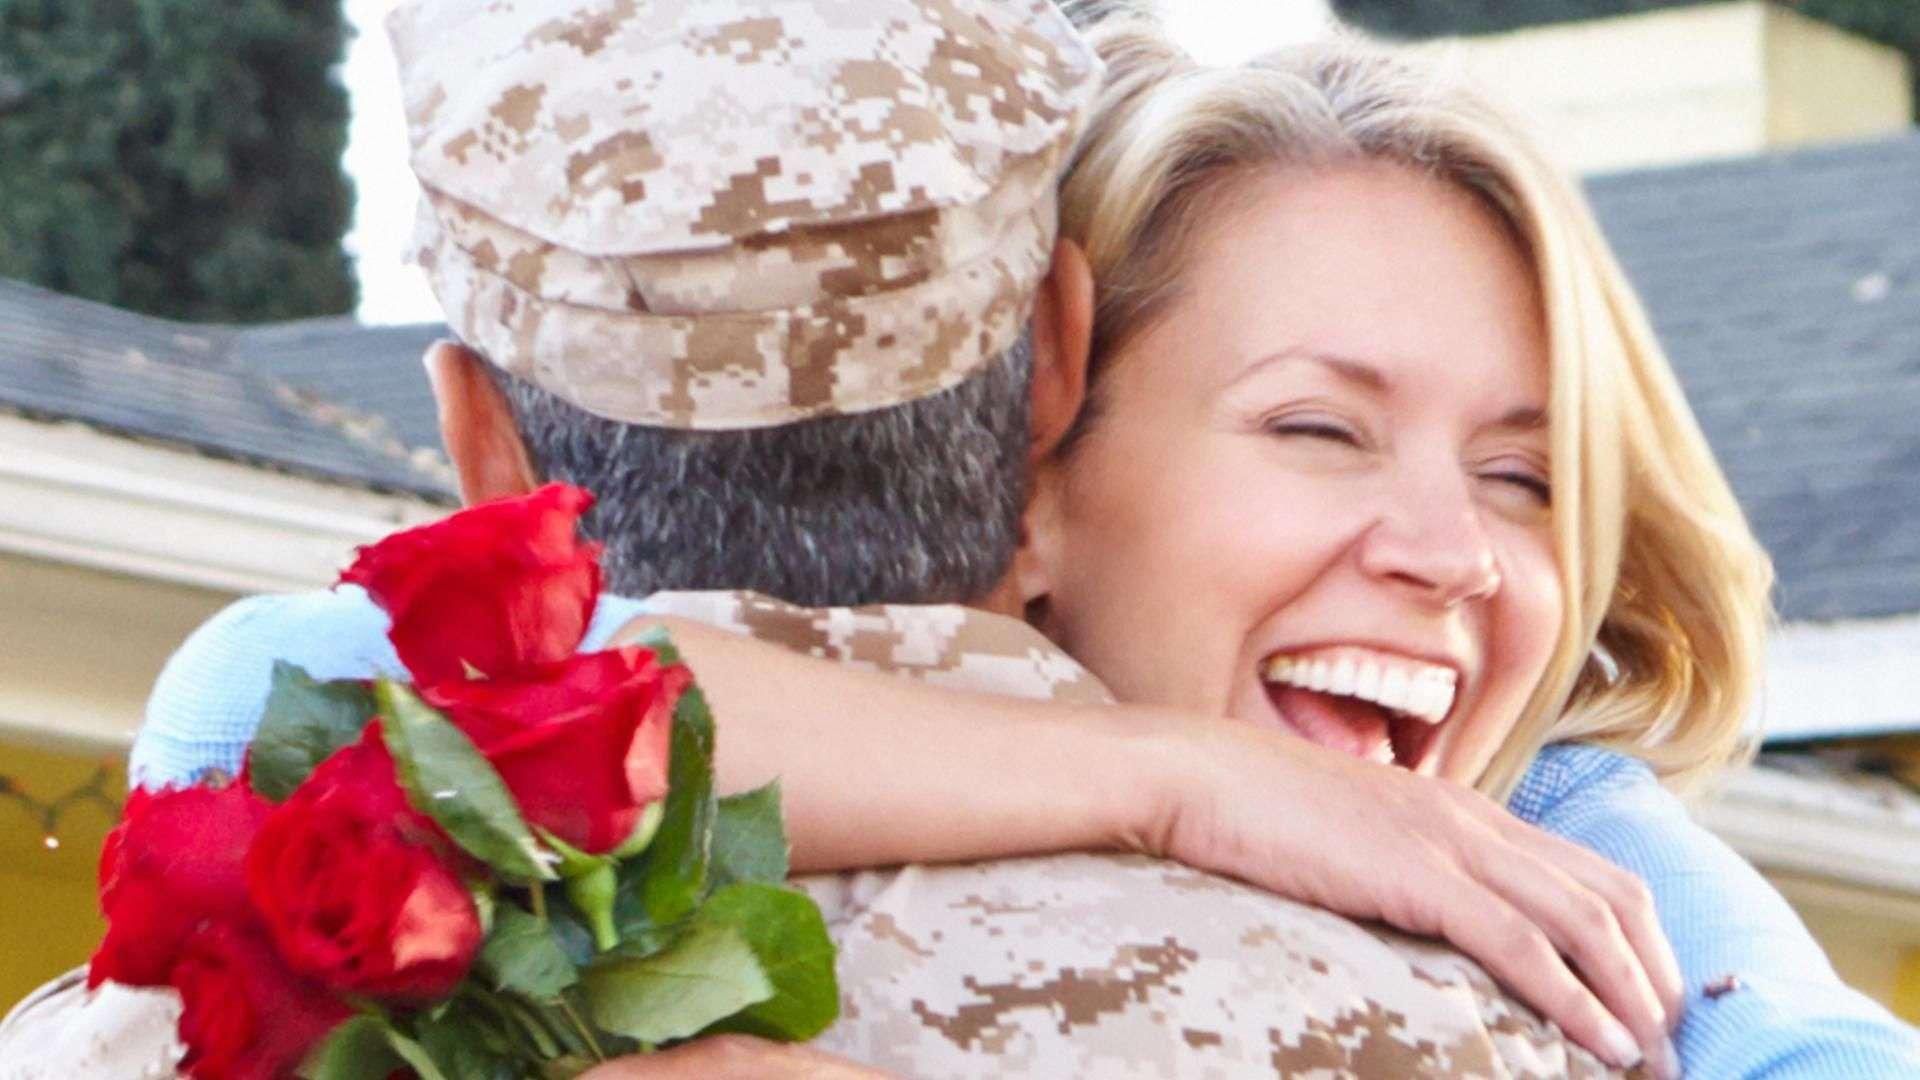 Confesiones militares reconfortantes